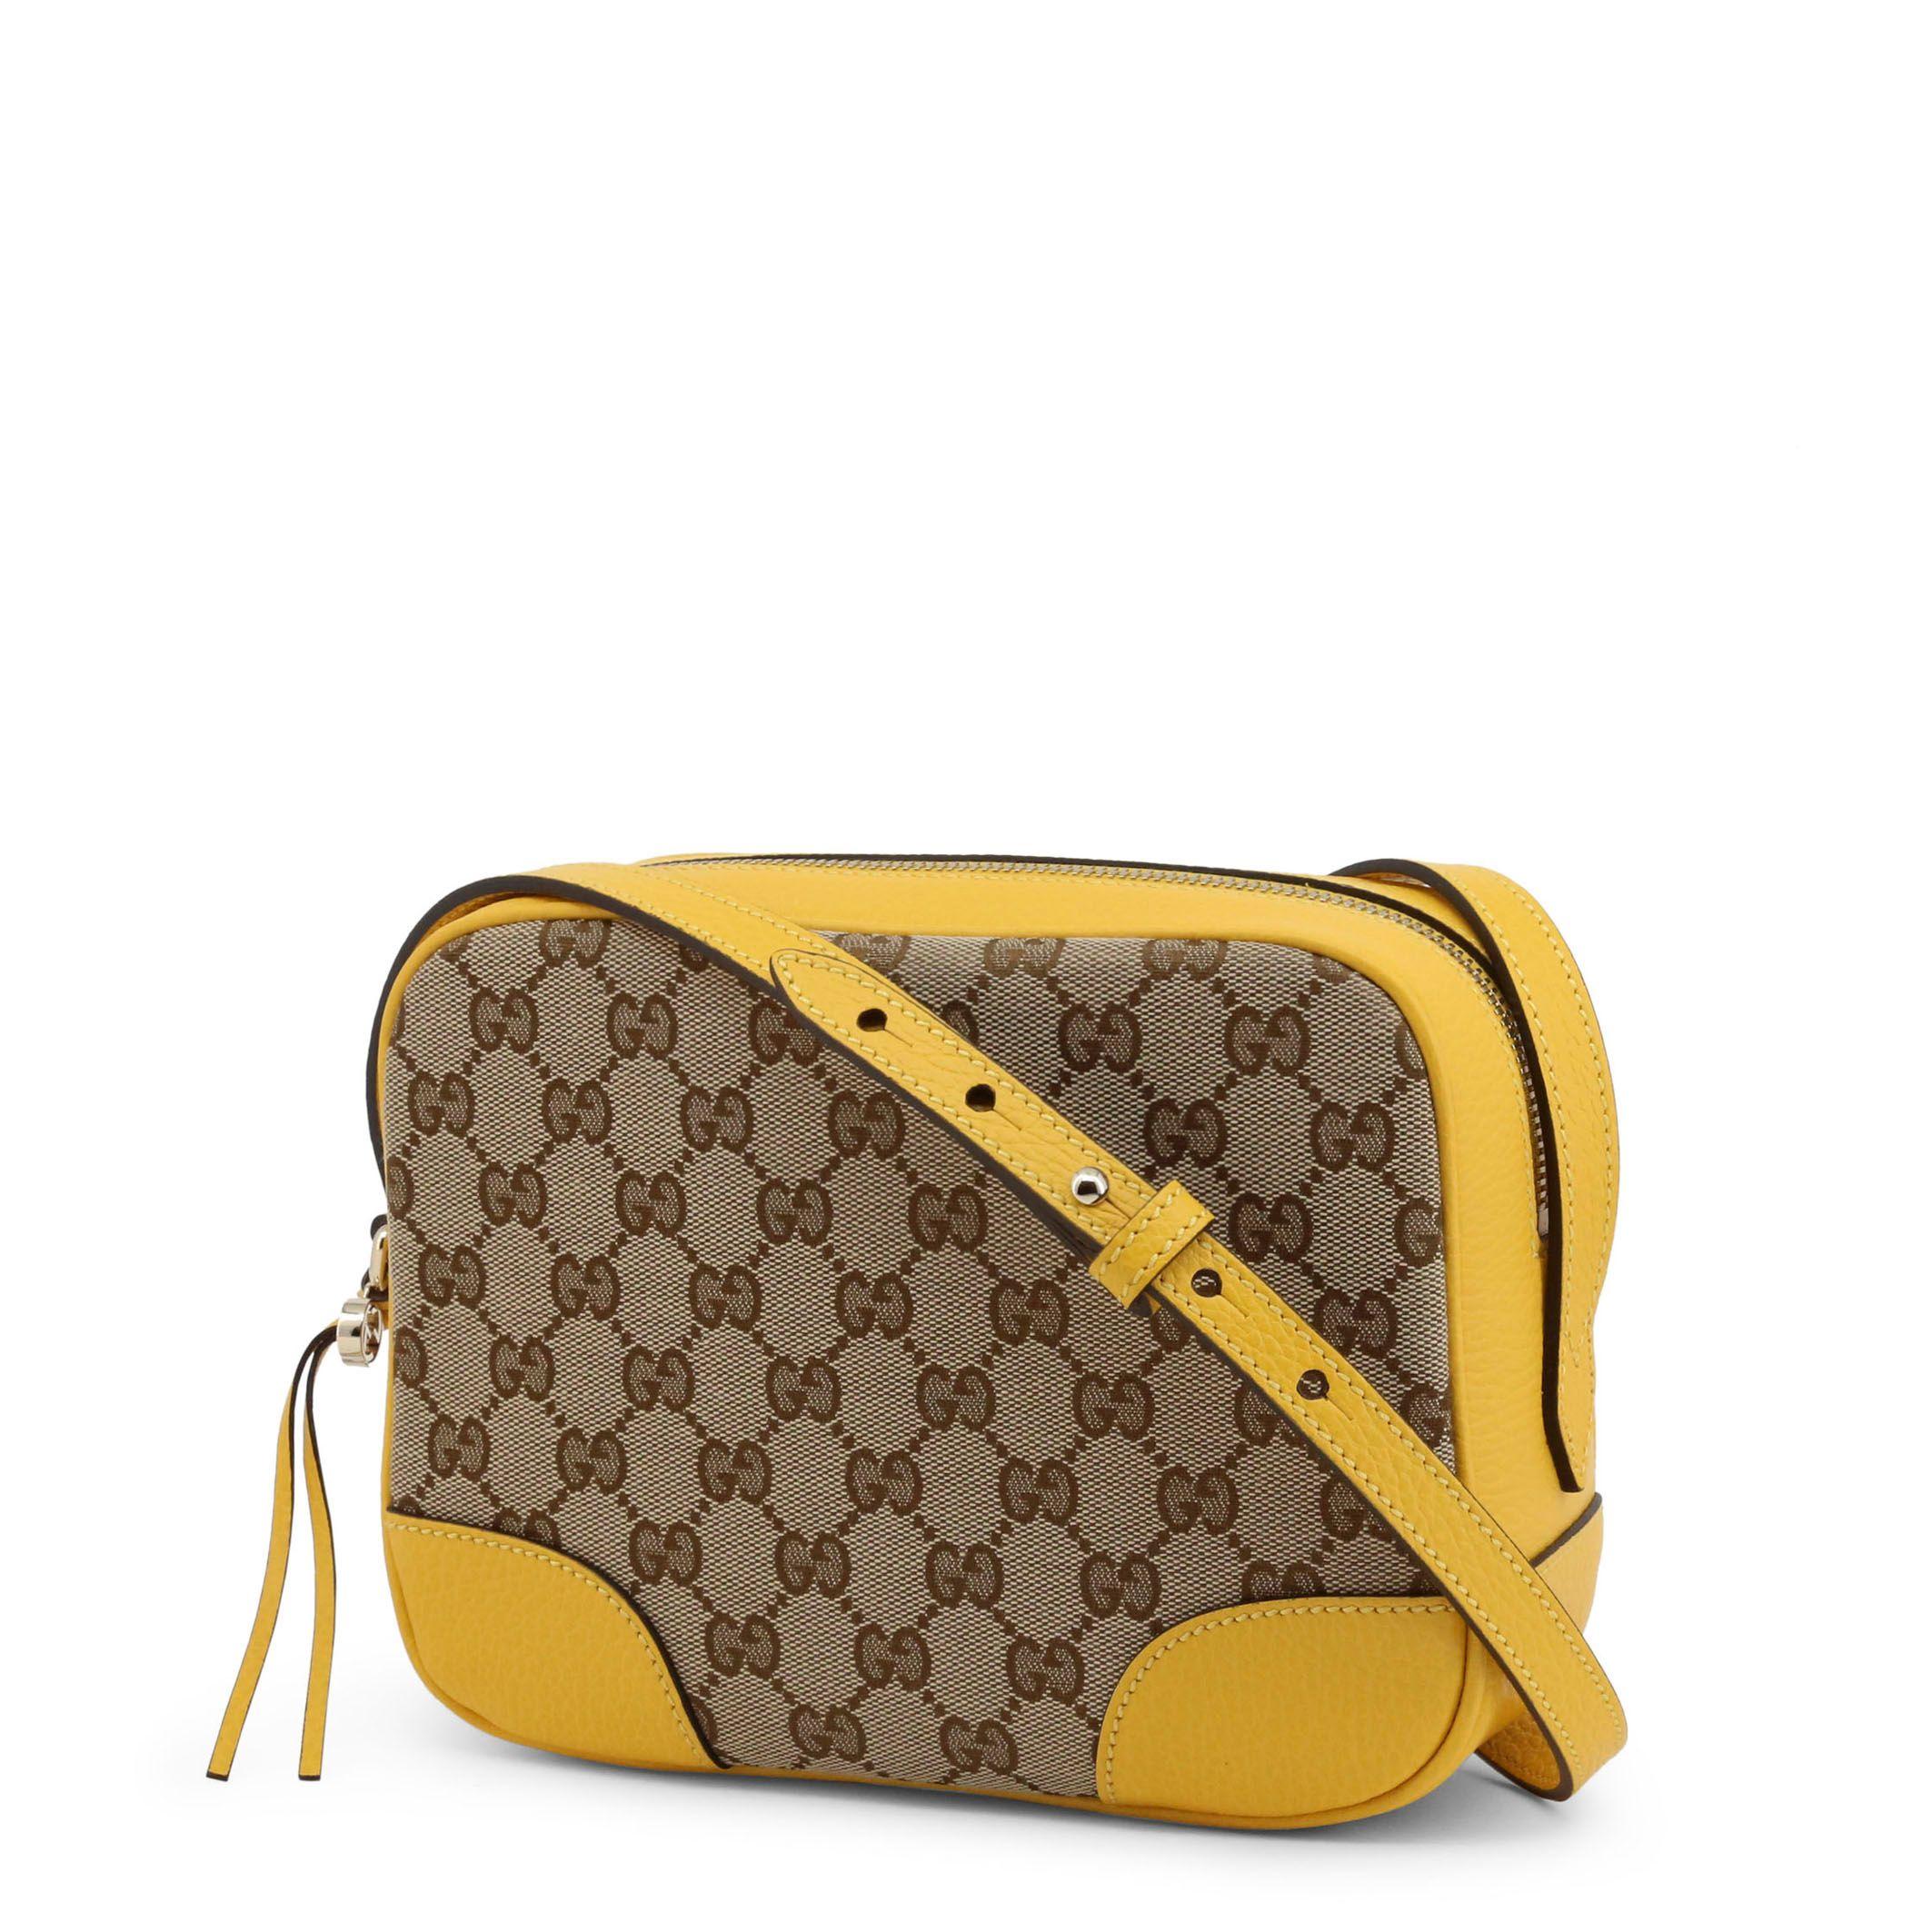 Gucci - 449413_ky9lg - braun 2